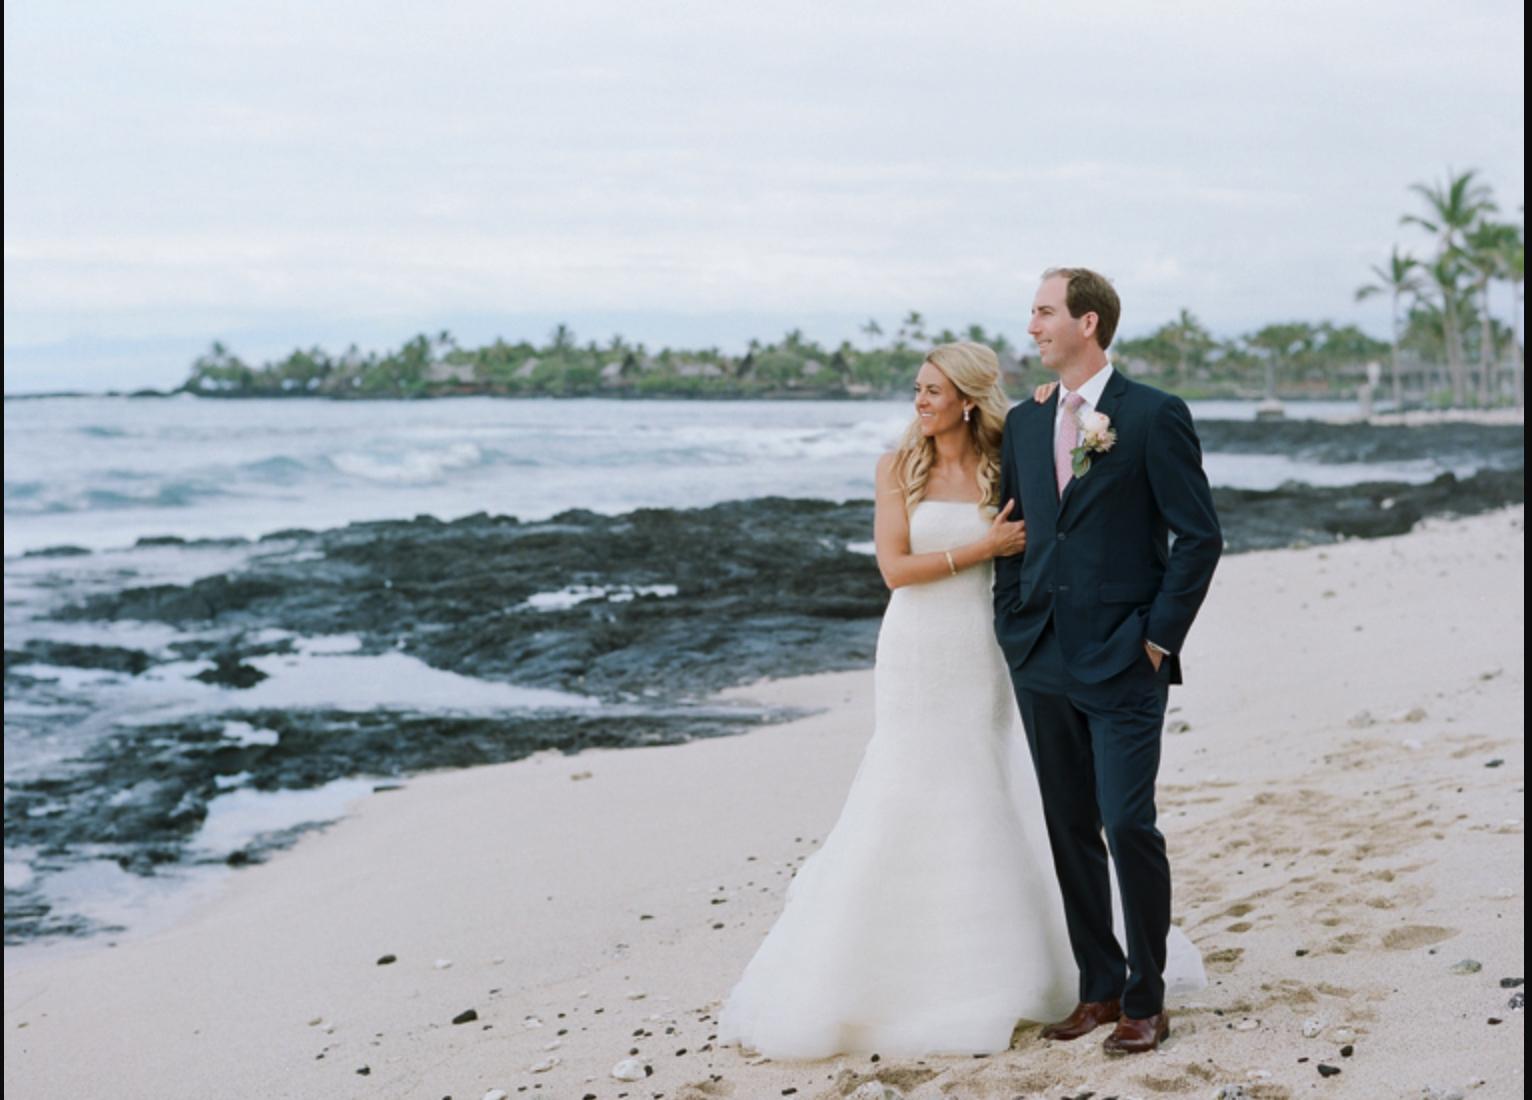 Hawaii Destination Wedding.Hawaii Destination Wedding Hip Service